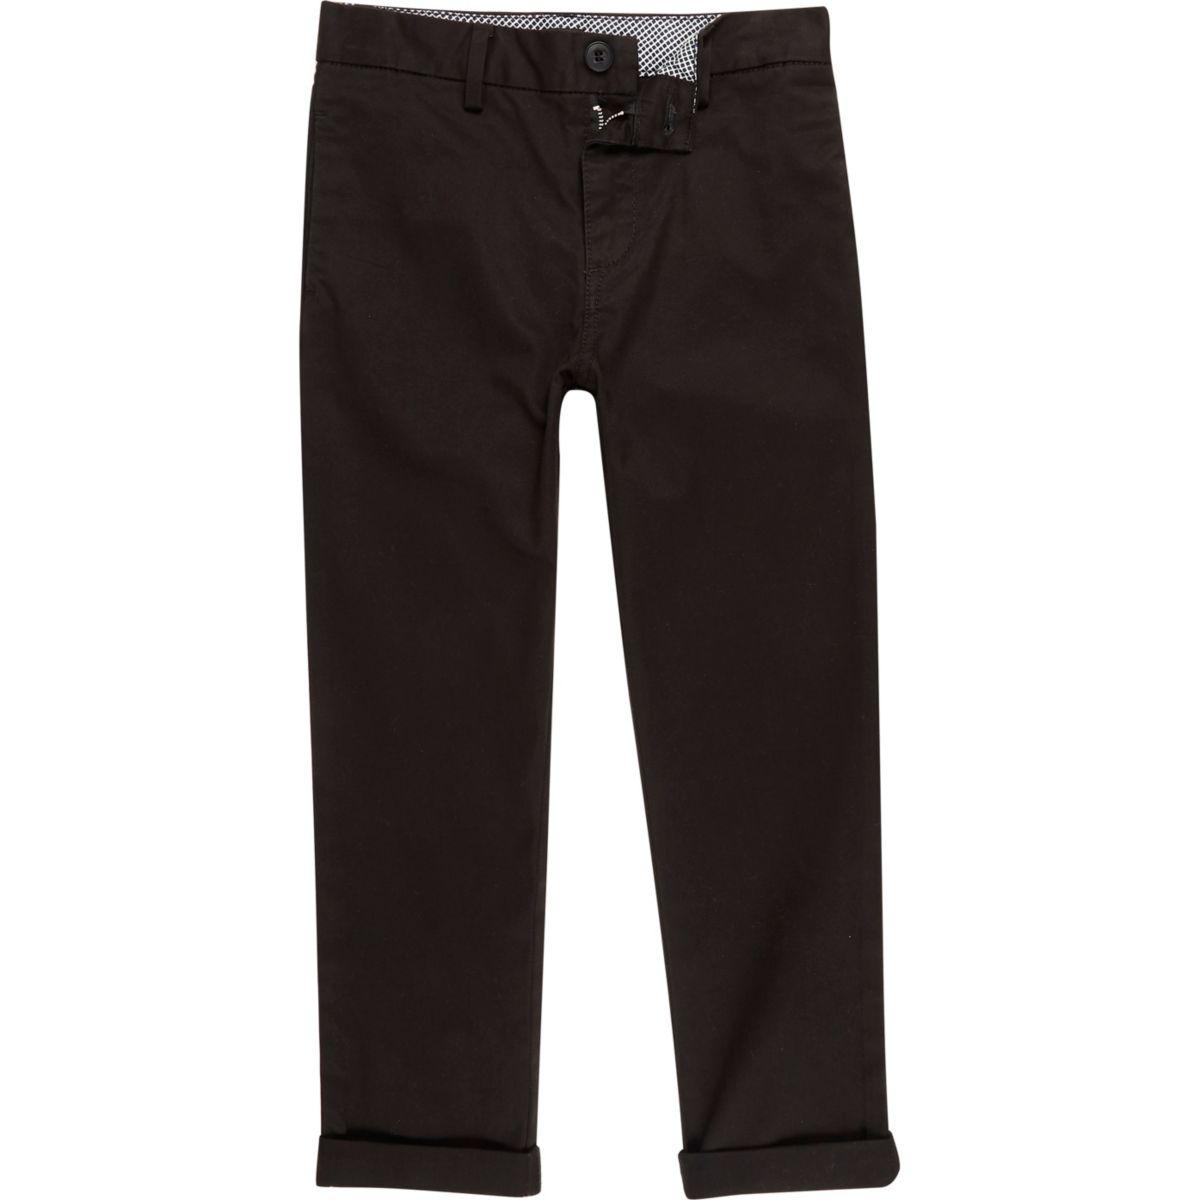 Boys black chino pants